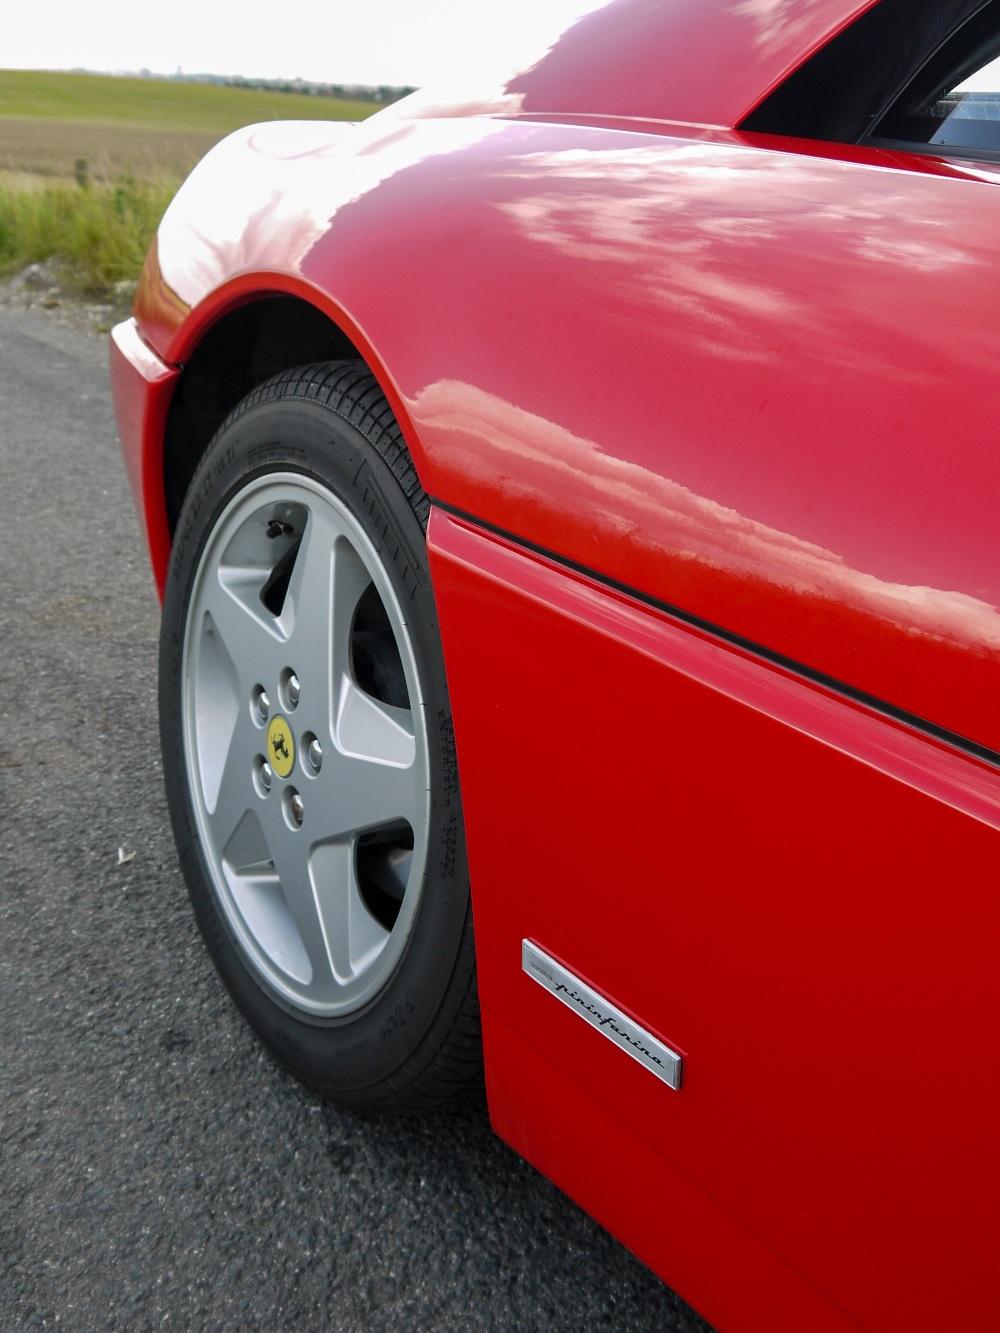 1993 FERRARI 348 TRASVERSALE BERLINETTA Registration Number: L796THC Chassis Number: - Image 17 of 49